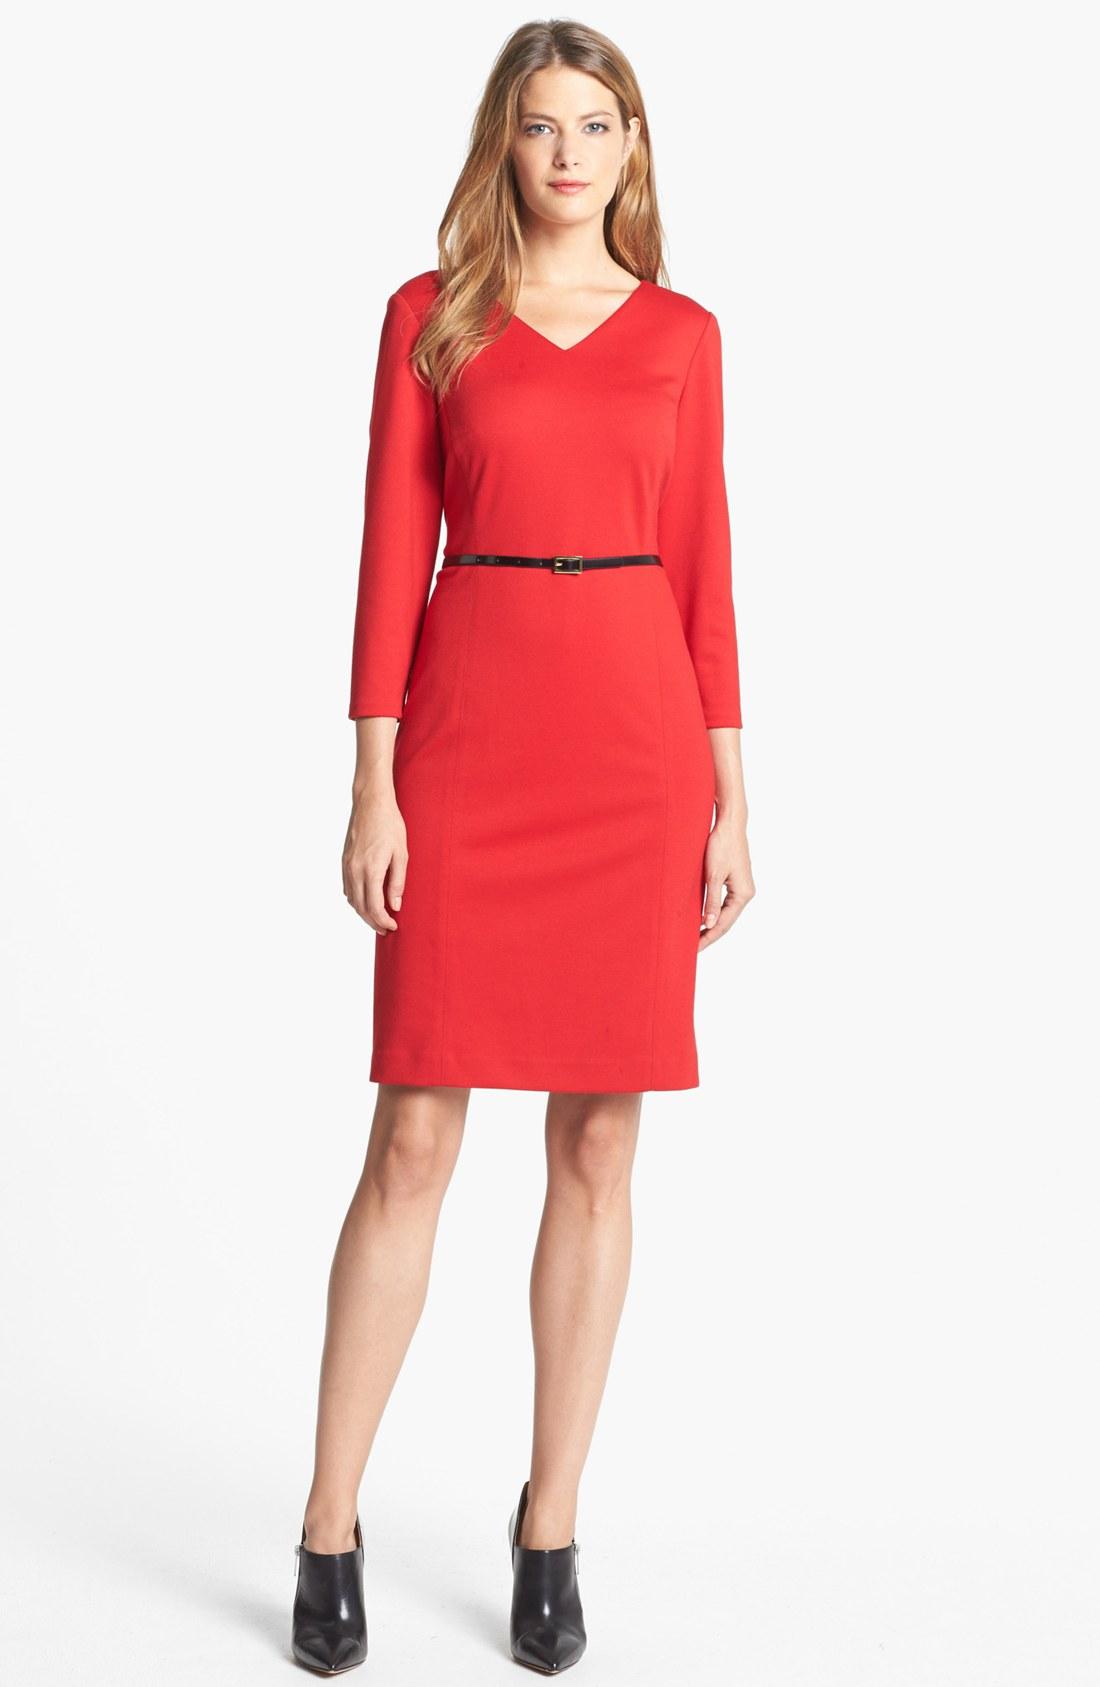 jones new york scarlet ponte sheath dress in red lyst. Black Bedroom Furniture Sets. Home Design Ideas